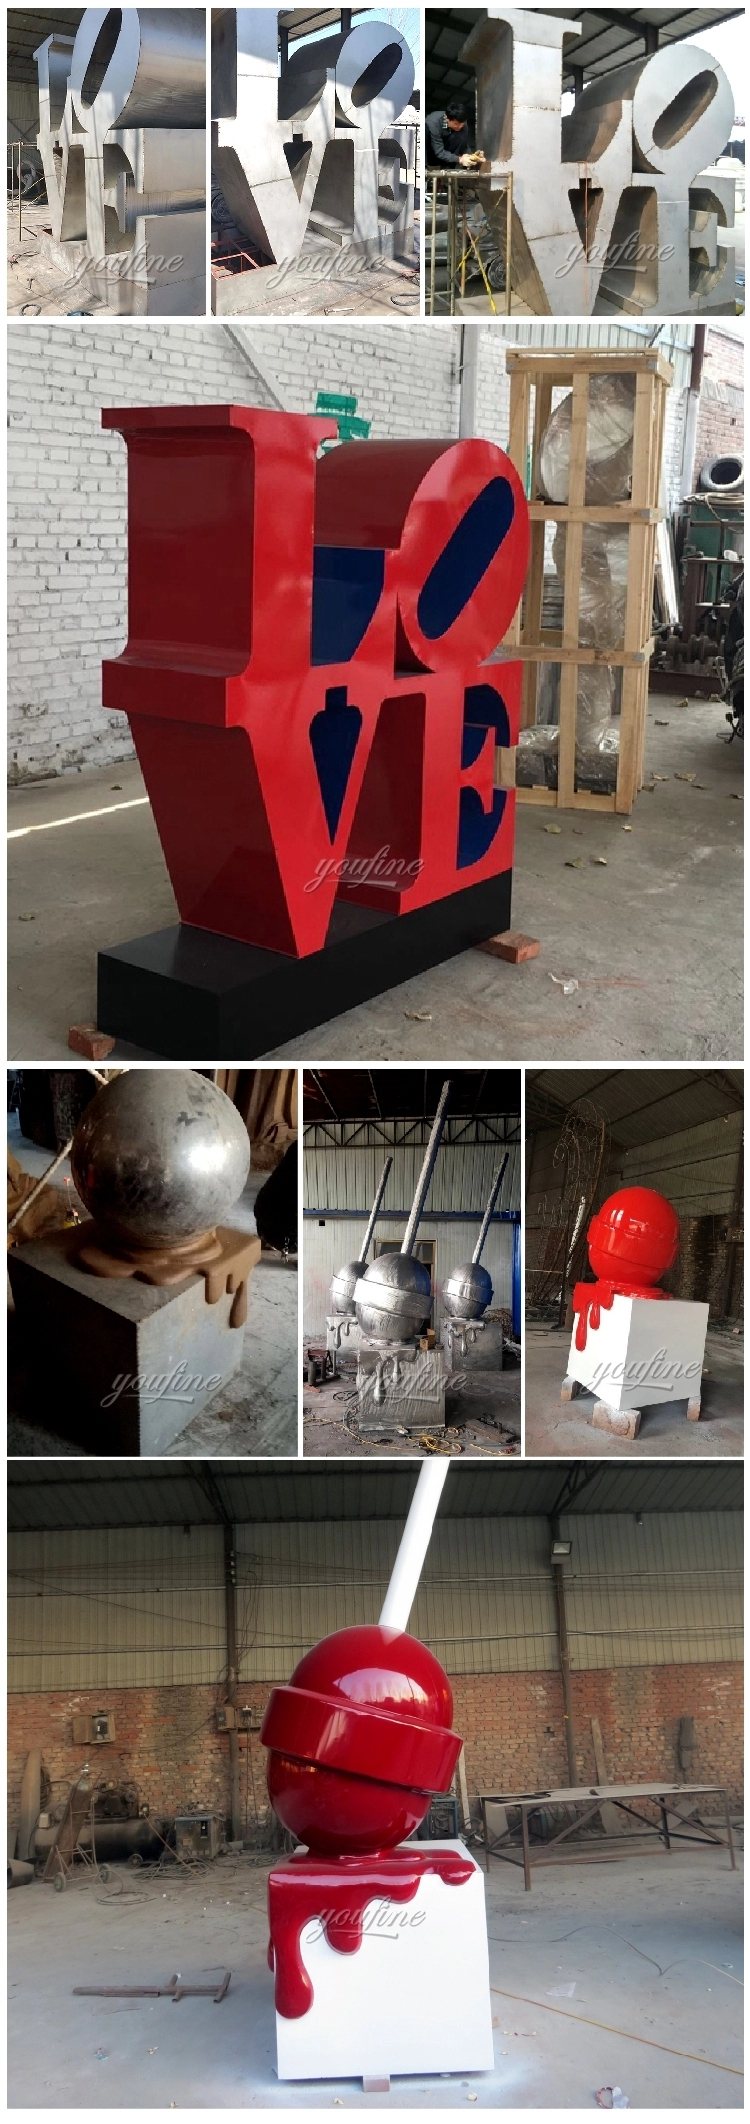 1IC18002 Modern Stainless Steel Sculpture Manufacturer (2)